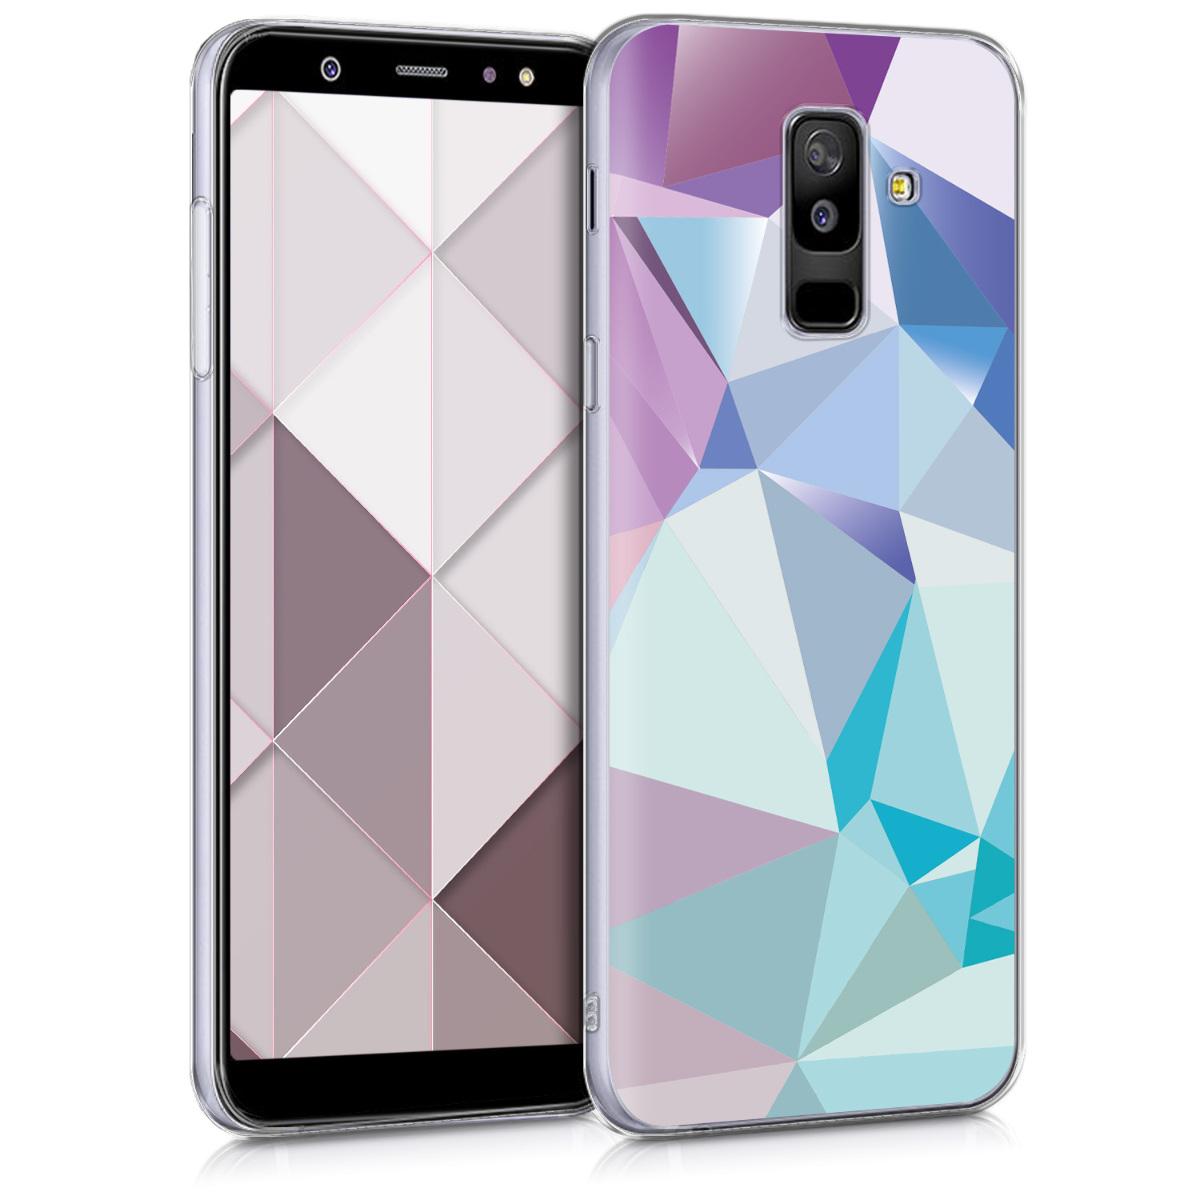 KW Θήκη Σιλικόνης Samsung Galaxy A6+/A6 Plus (2018) - Light Blue / Light Pink / Blue (45260.09)